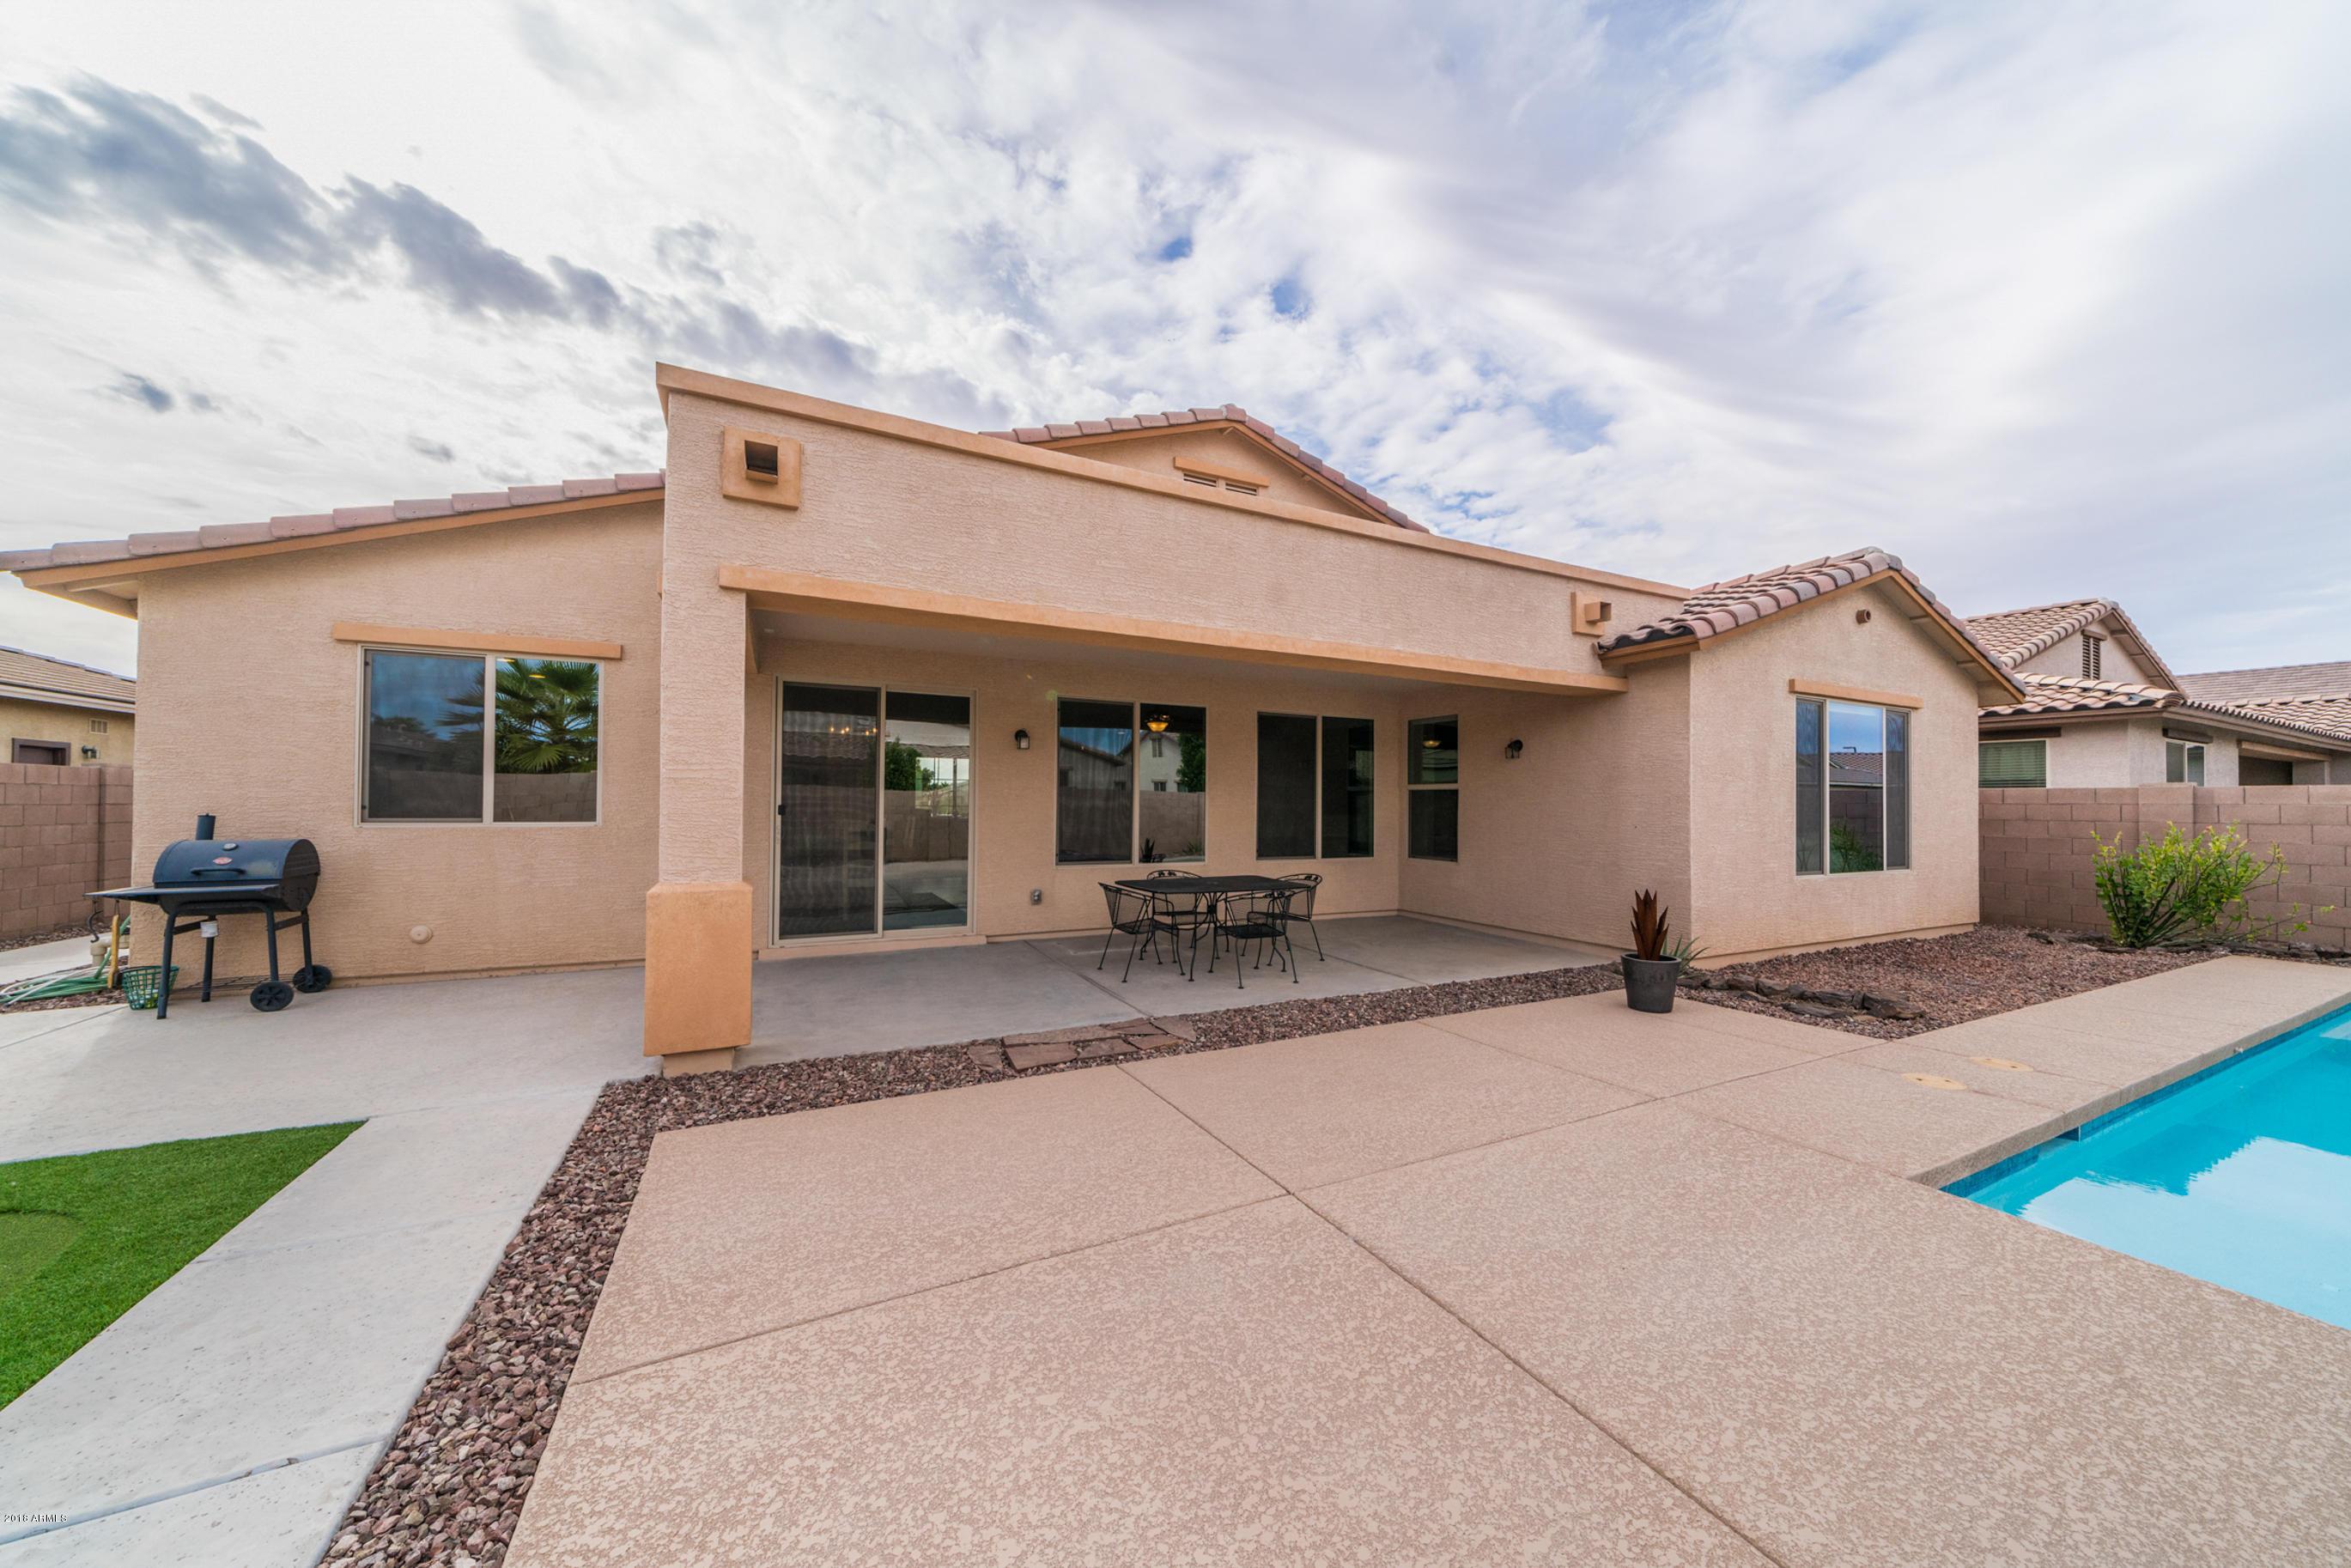 MLS 5852810 2506 E ORLEANS Drive, Gilbert, AZ 85298 Gilbert AZ Freeman Farms